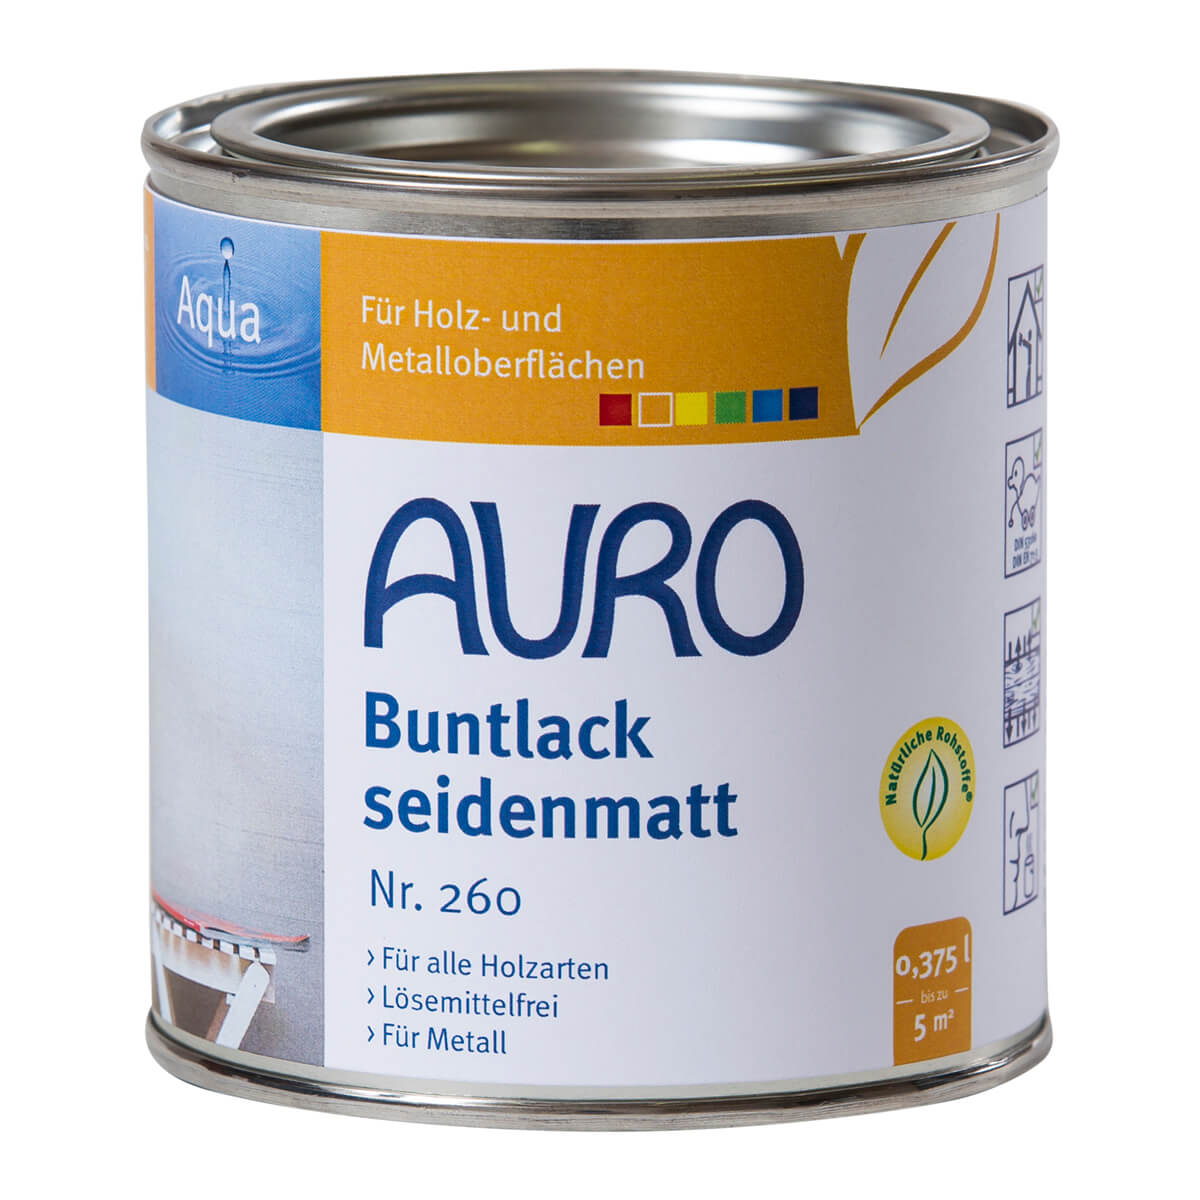 AURO Buntlack und Weißlack, seidenmatt, Aqua Nr. 260